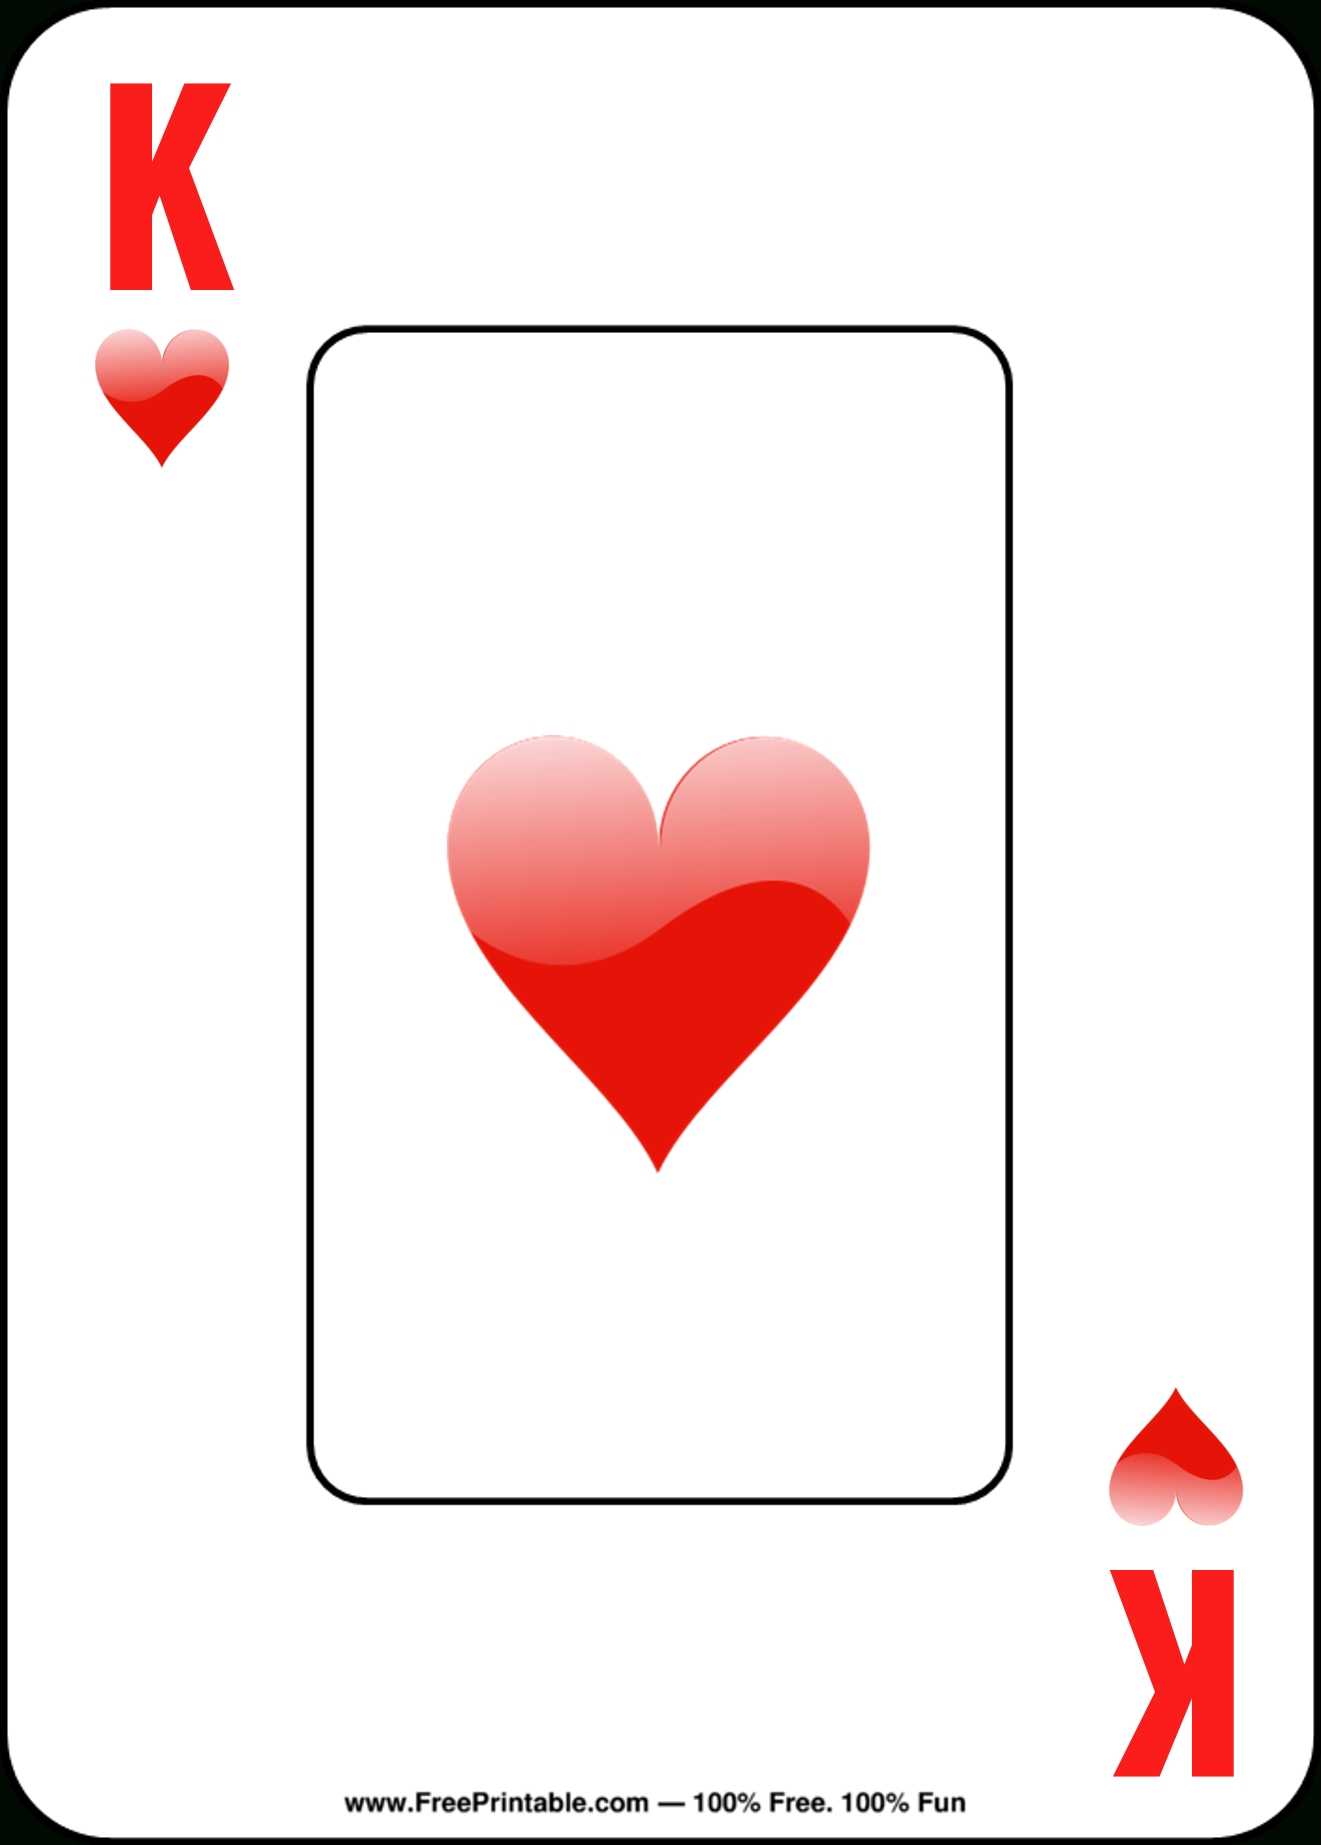 Printable Playing Cards | Chart And Printable World - Free Printable Deck Of Cards